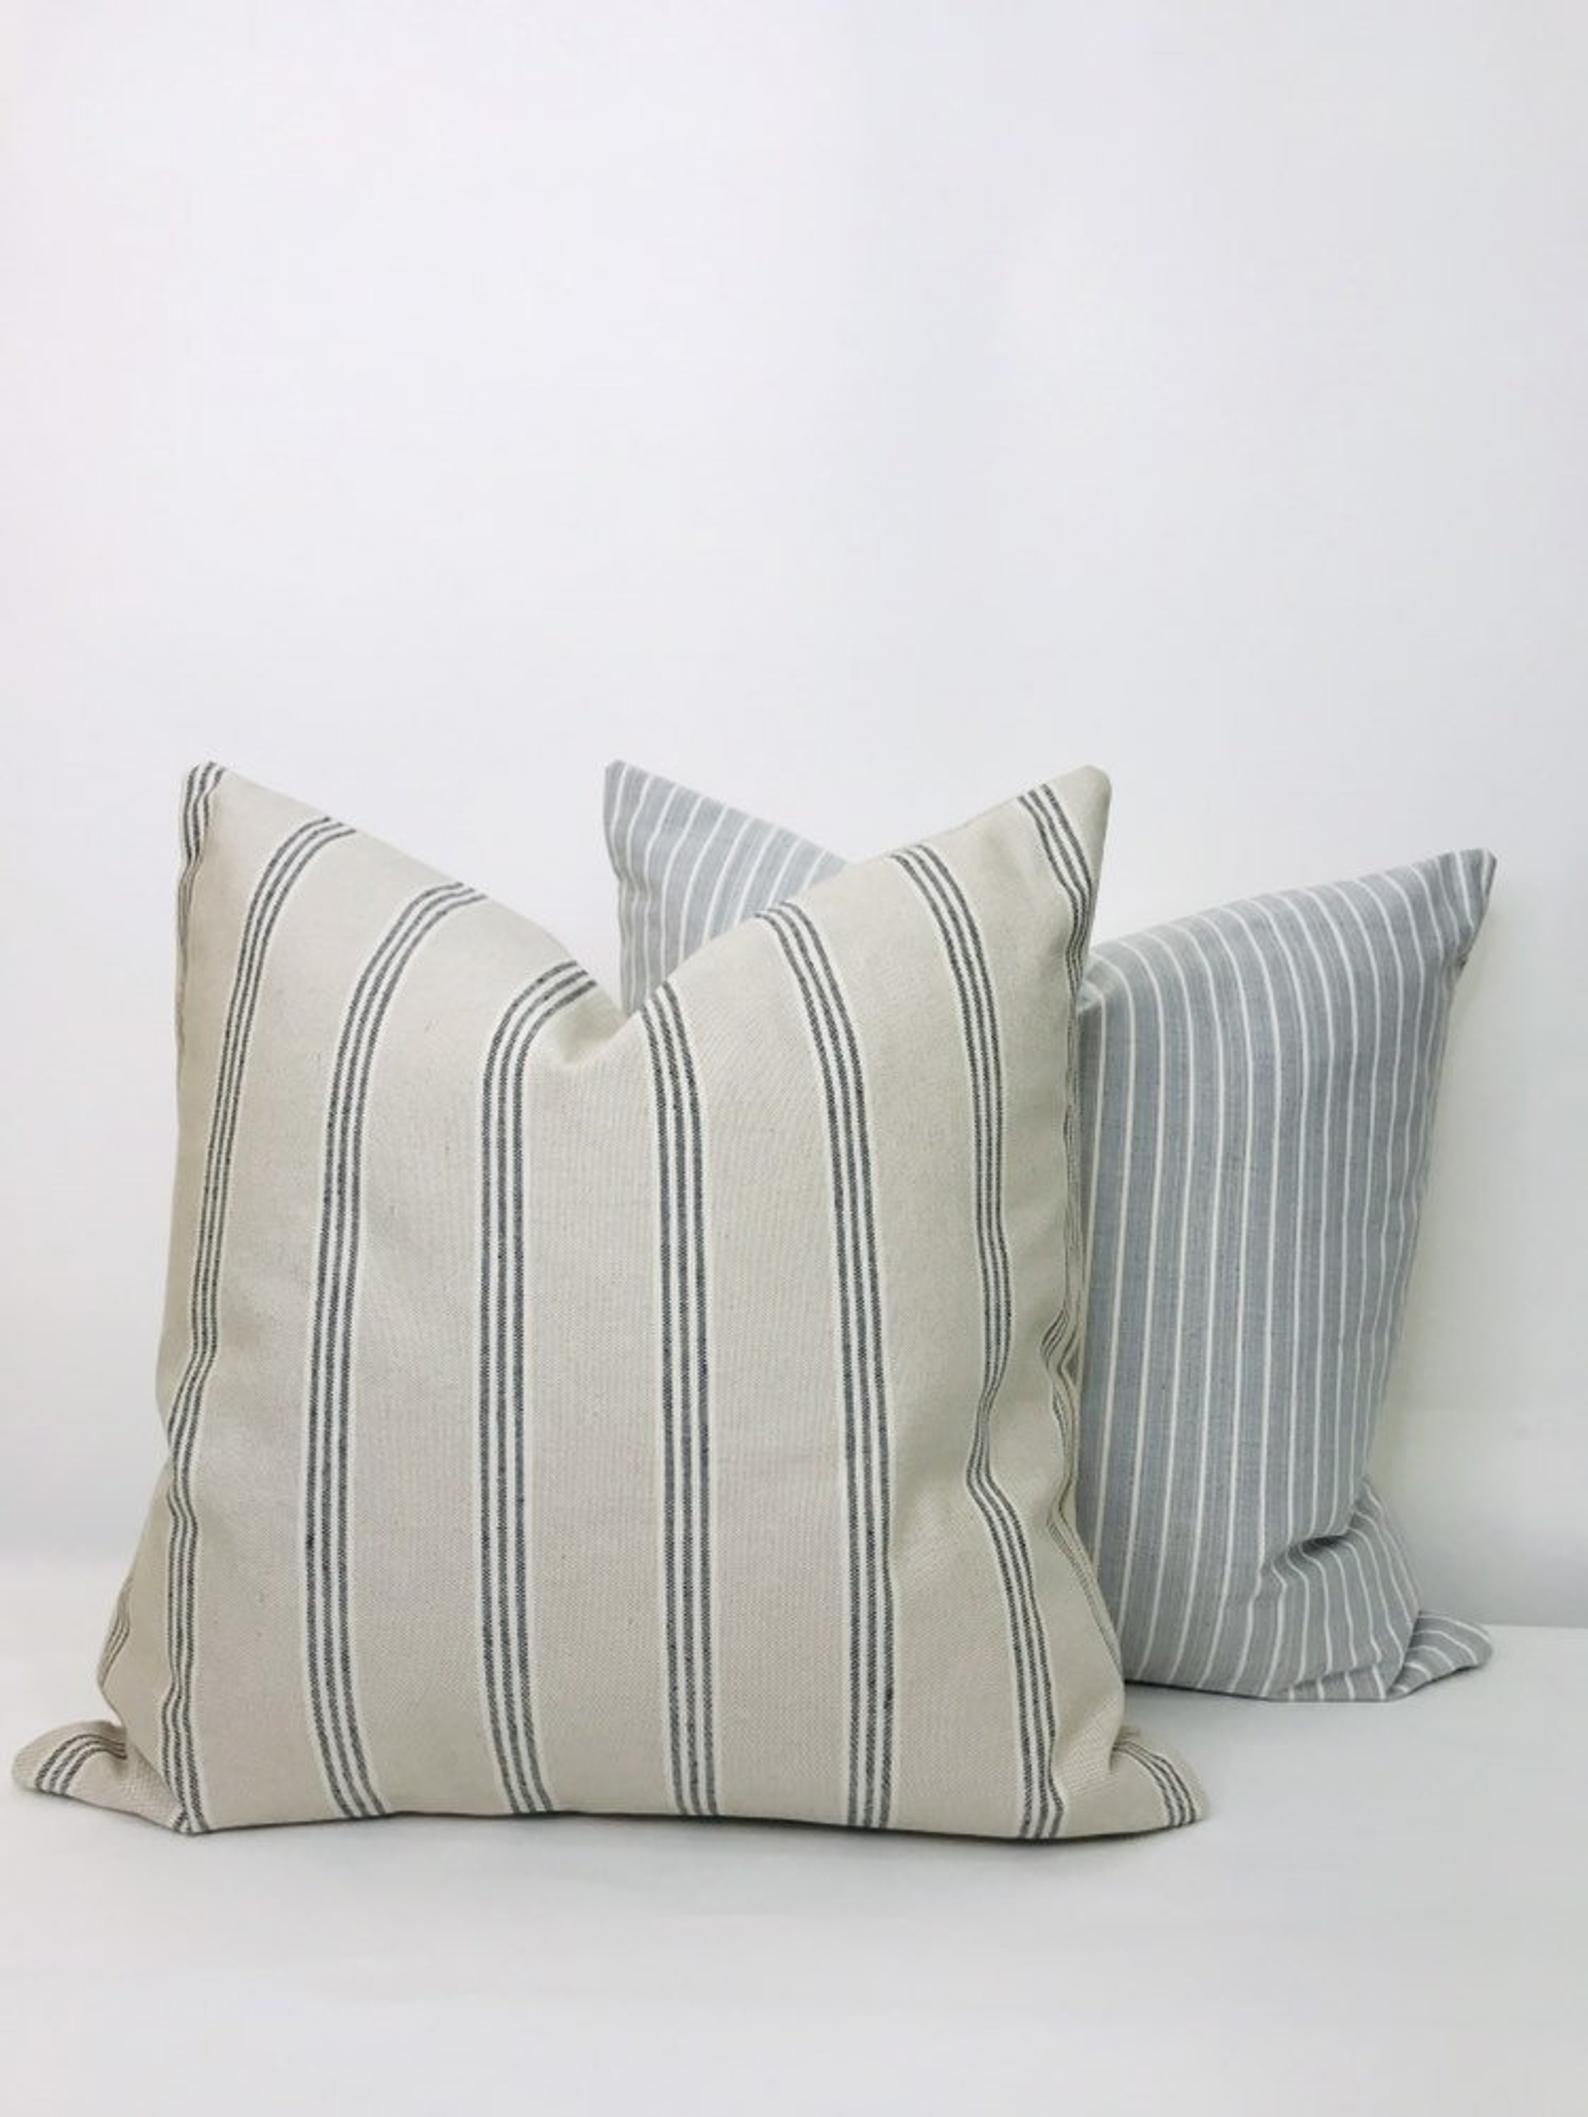 Farmhouse ticking stripe pillow cover beige pillow cover